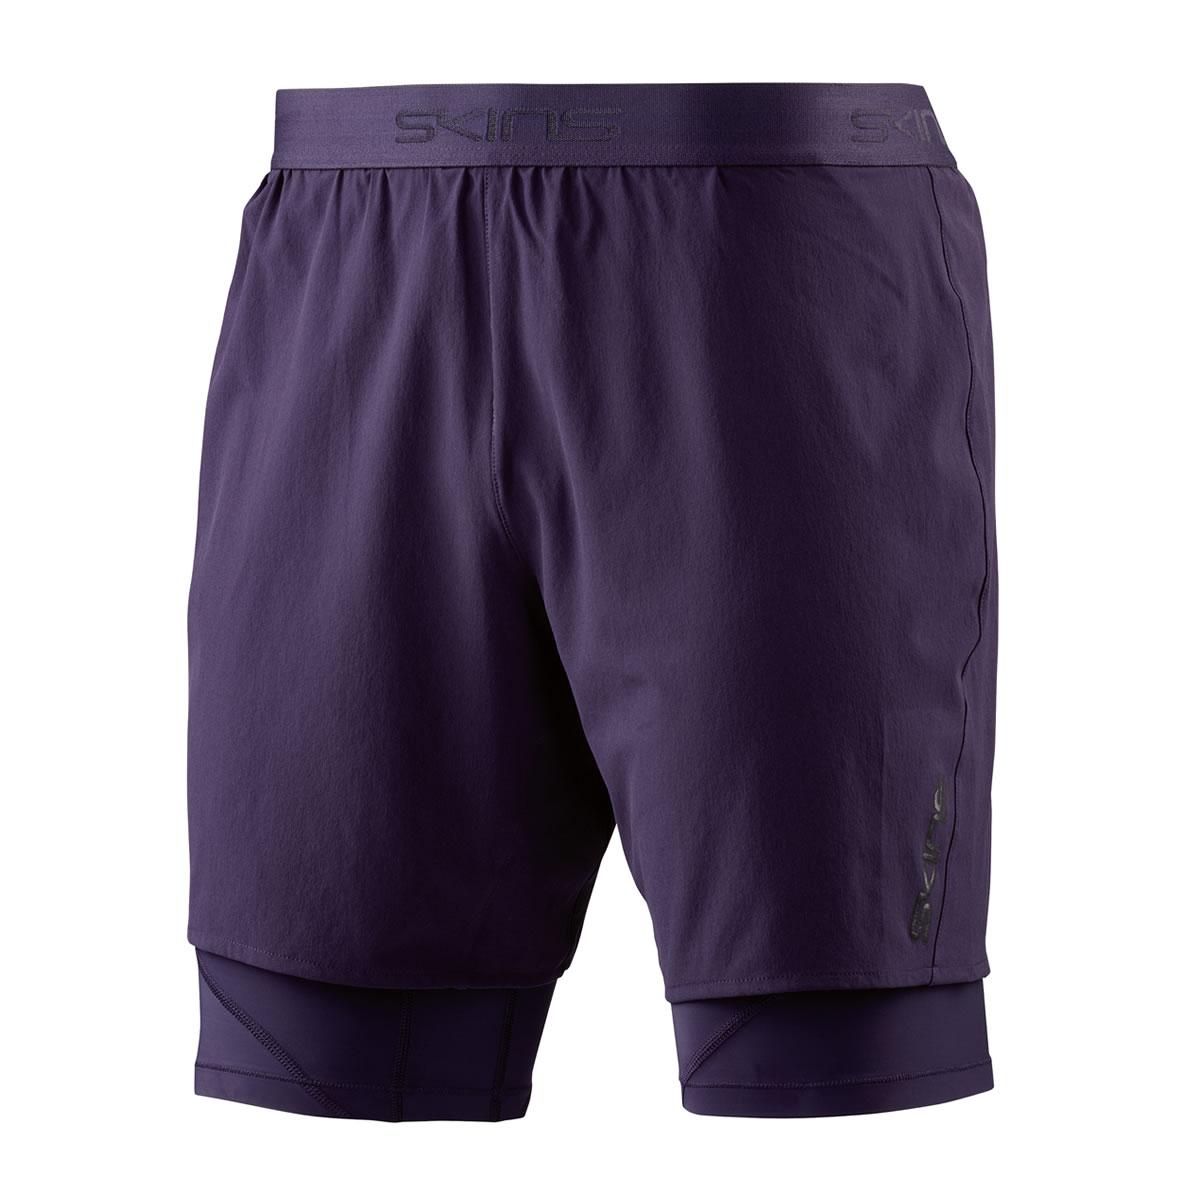 e6240abadc205 DA99051652029-dnamic-superpose-half-tights-men-skins-mariner.jpg